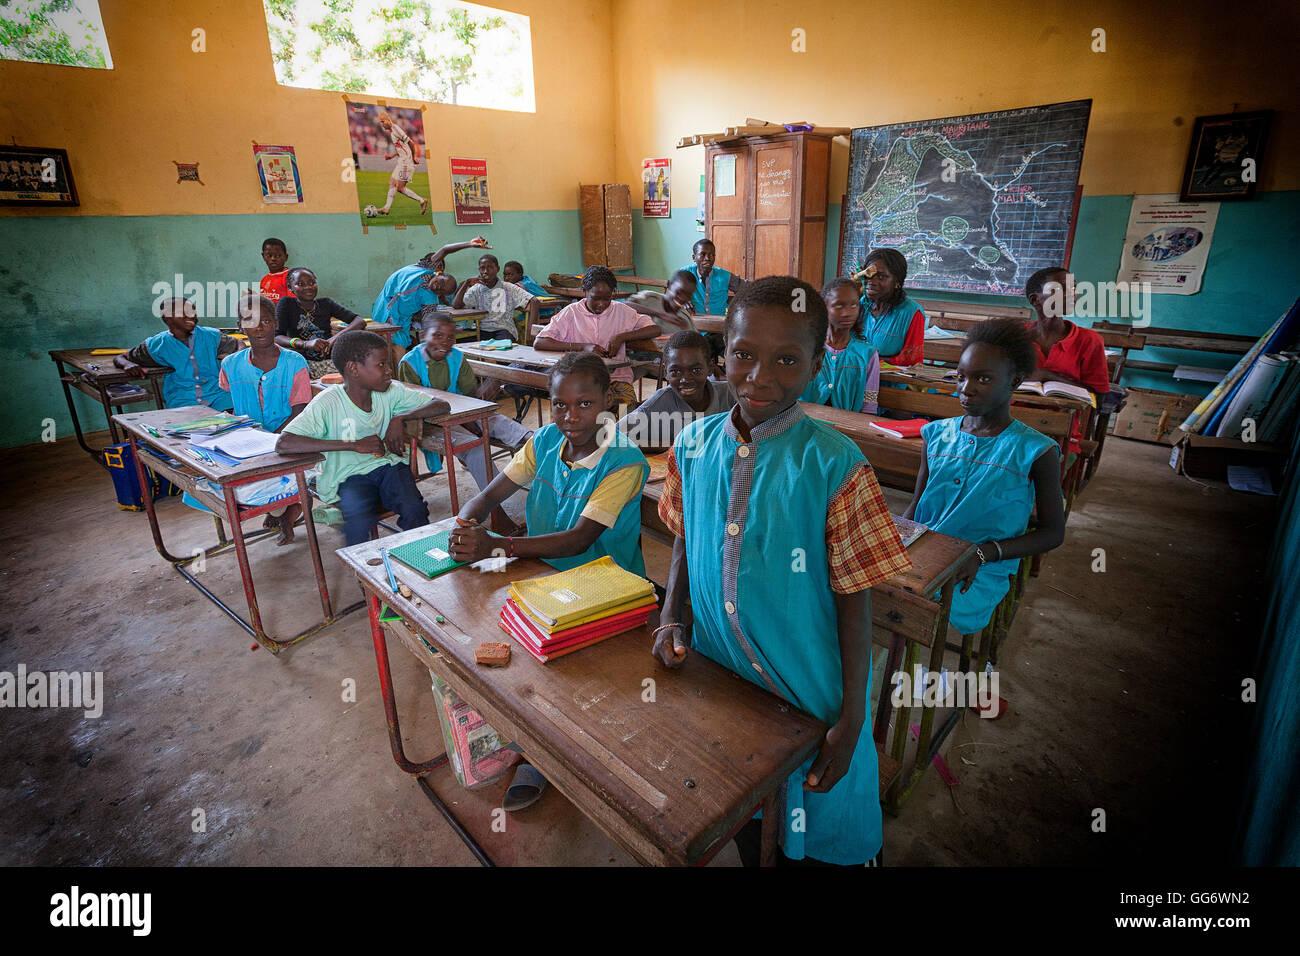 Scuola Afiniam bambini, Casamance, Senegal Immagini Stock